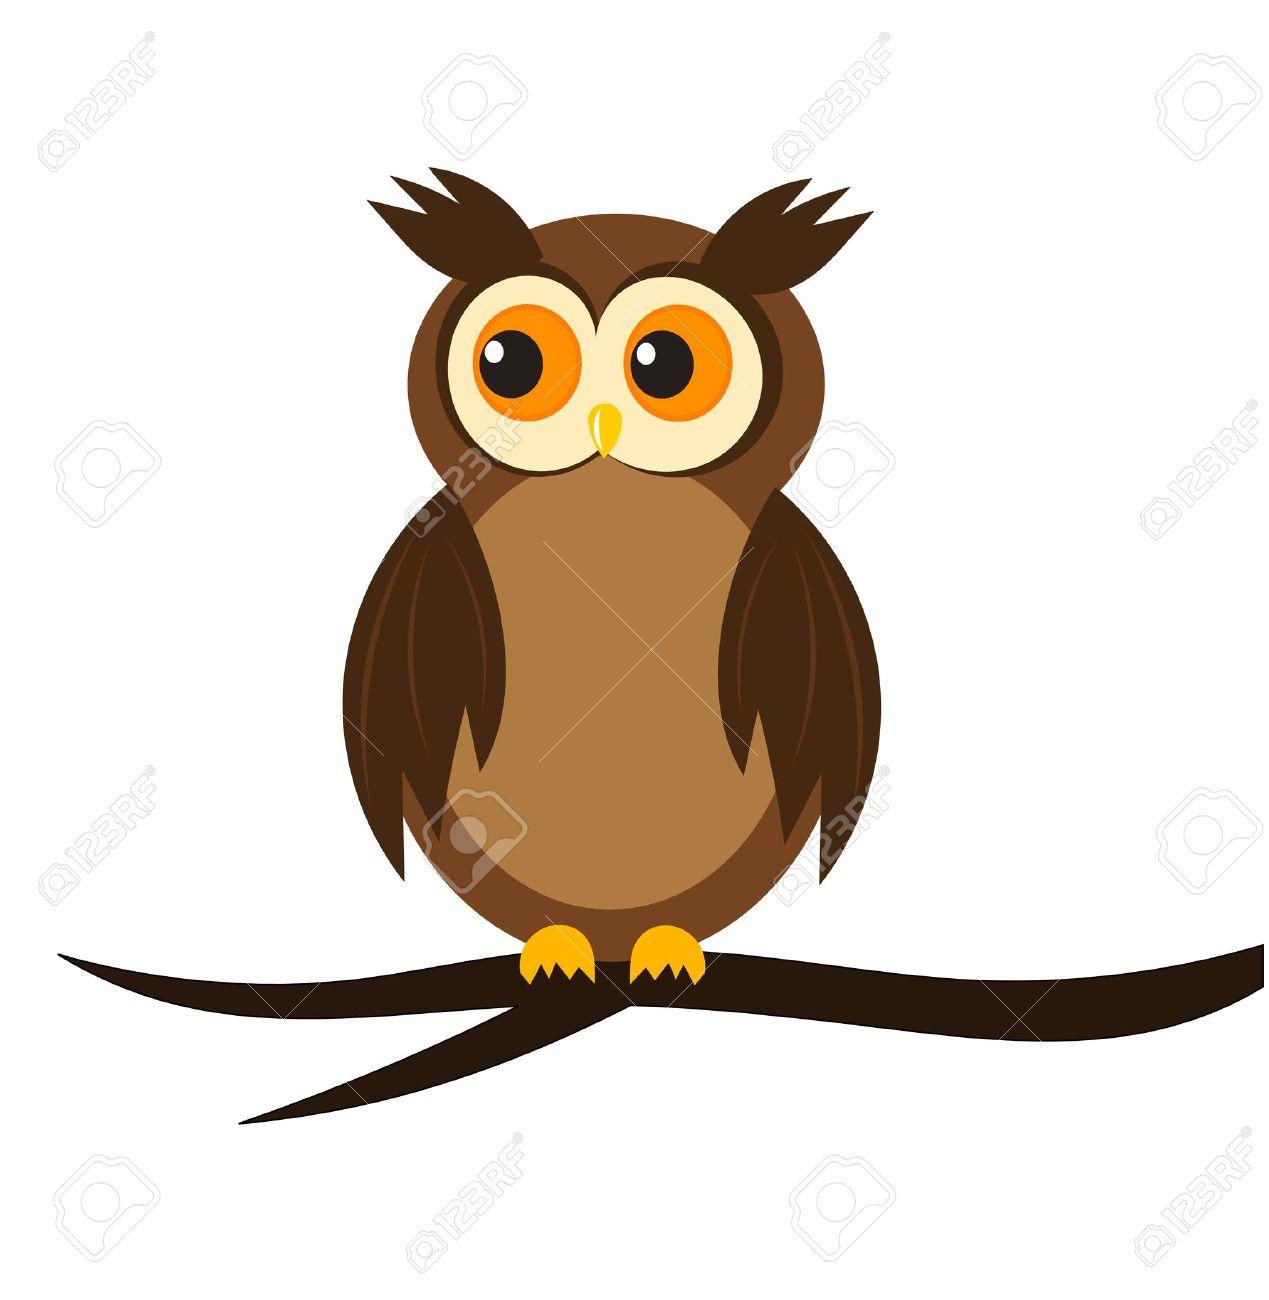 31 905 owl cartoon stock vector illustration and royalty free owl rh 123rf com cute owl cartoon images wise owl images cartoon